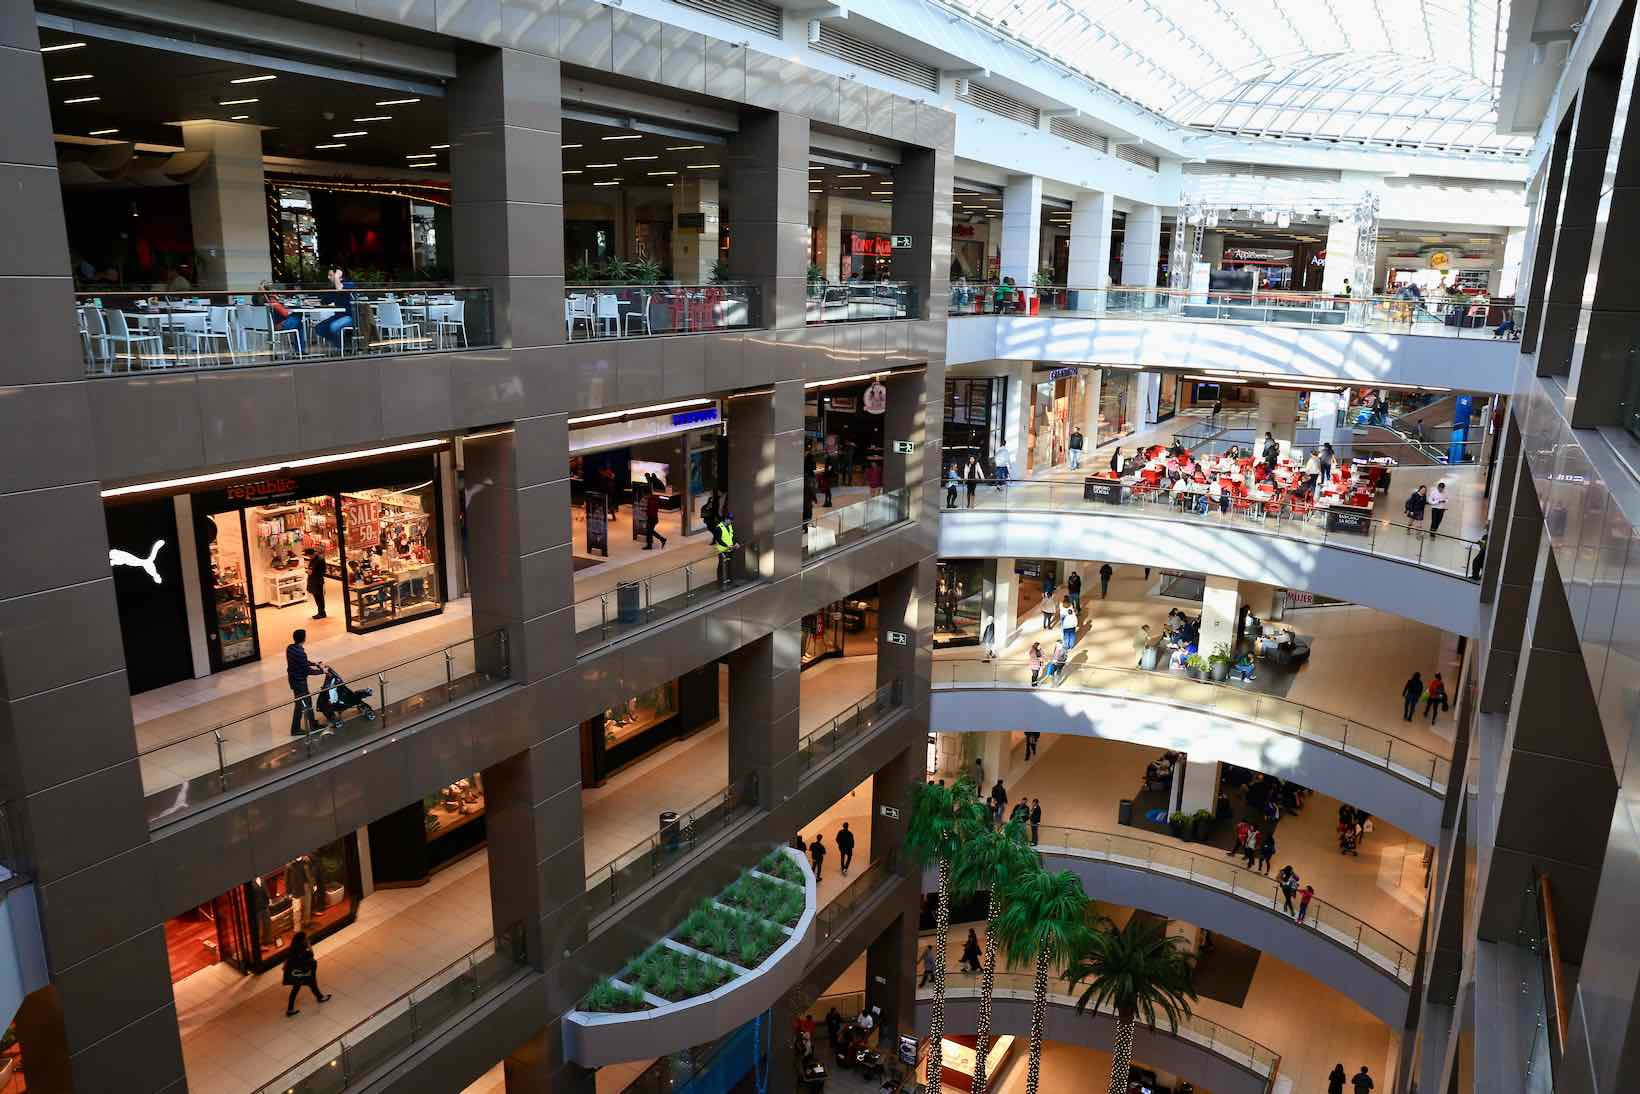 compras santiago costanera mall